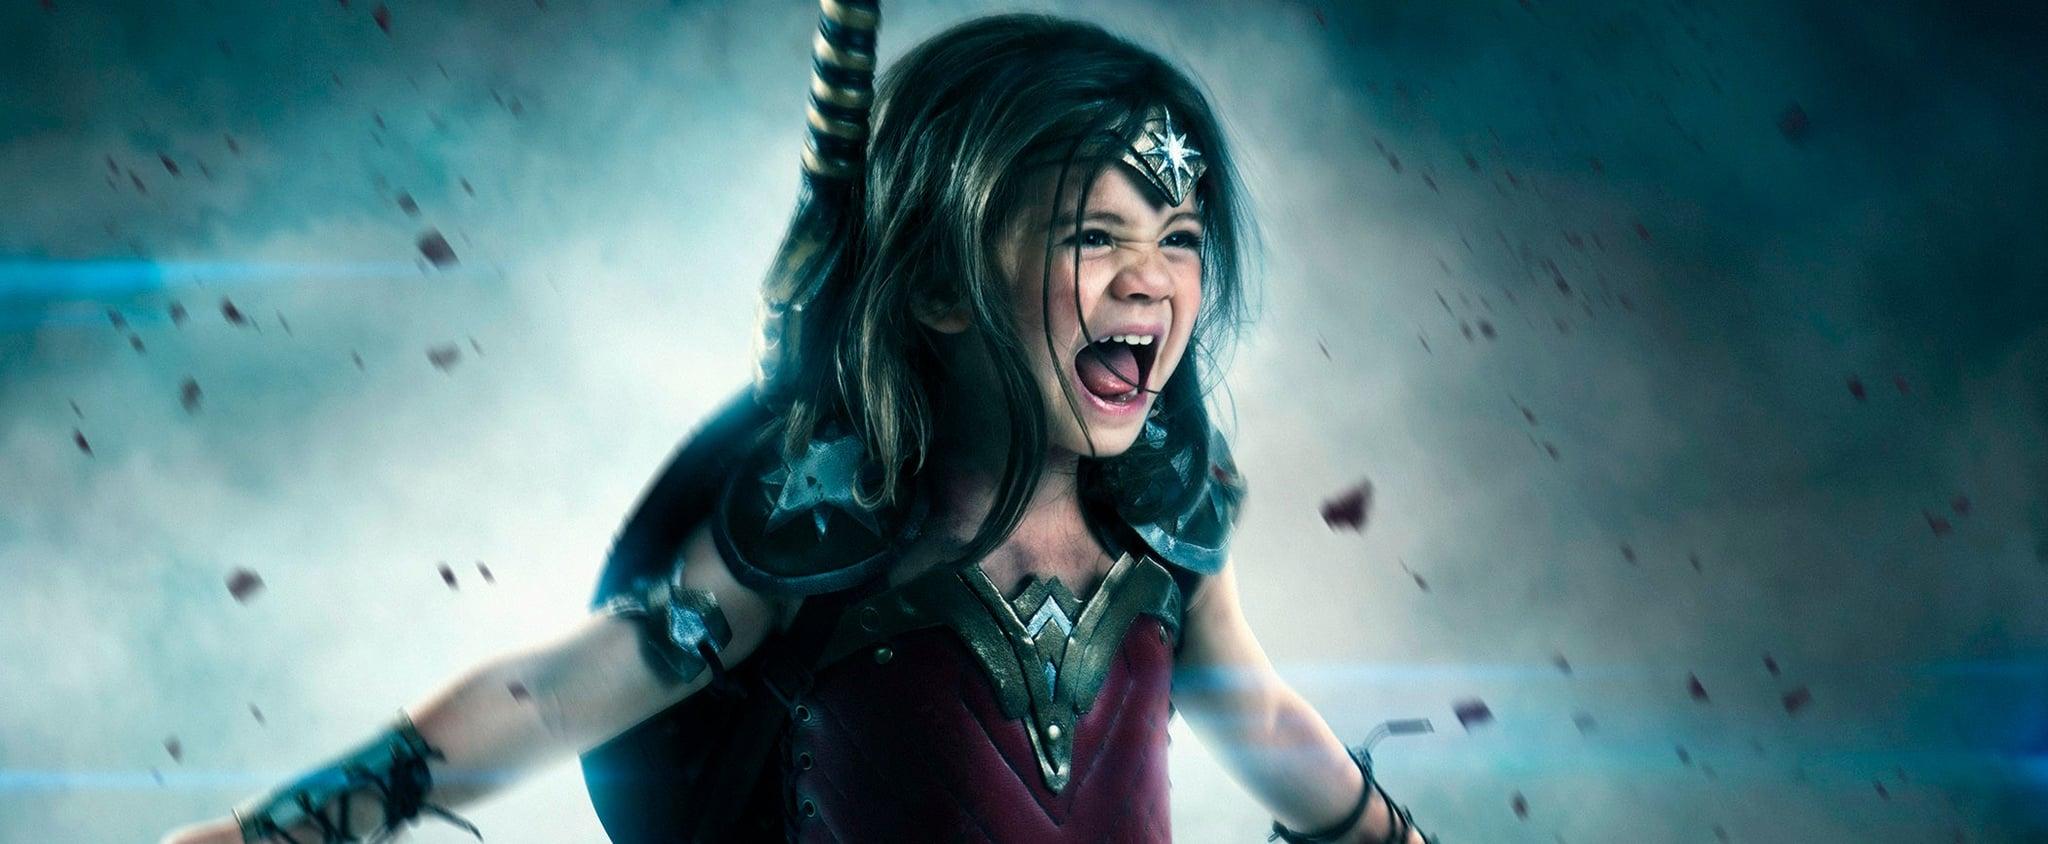 Little Girl Wonder Woman Cosplay